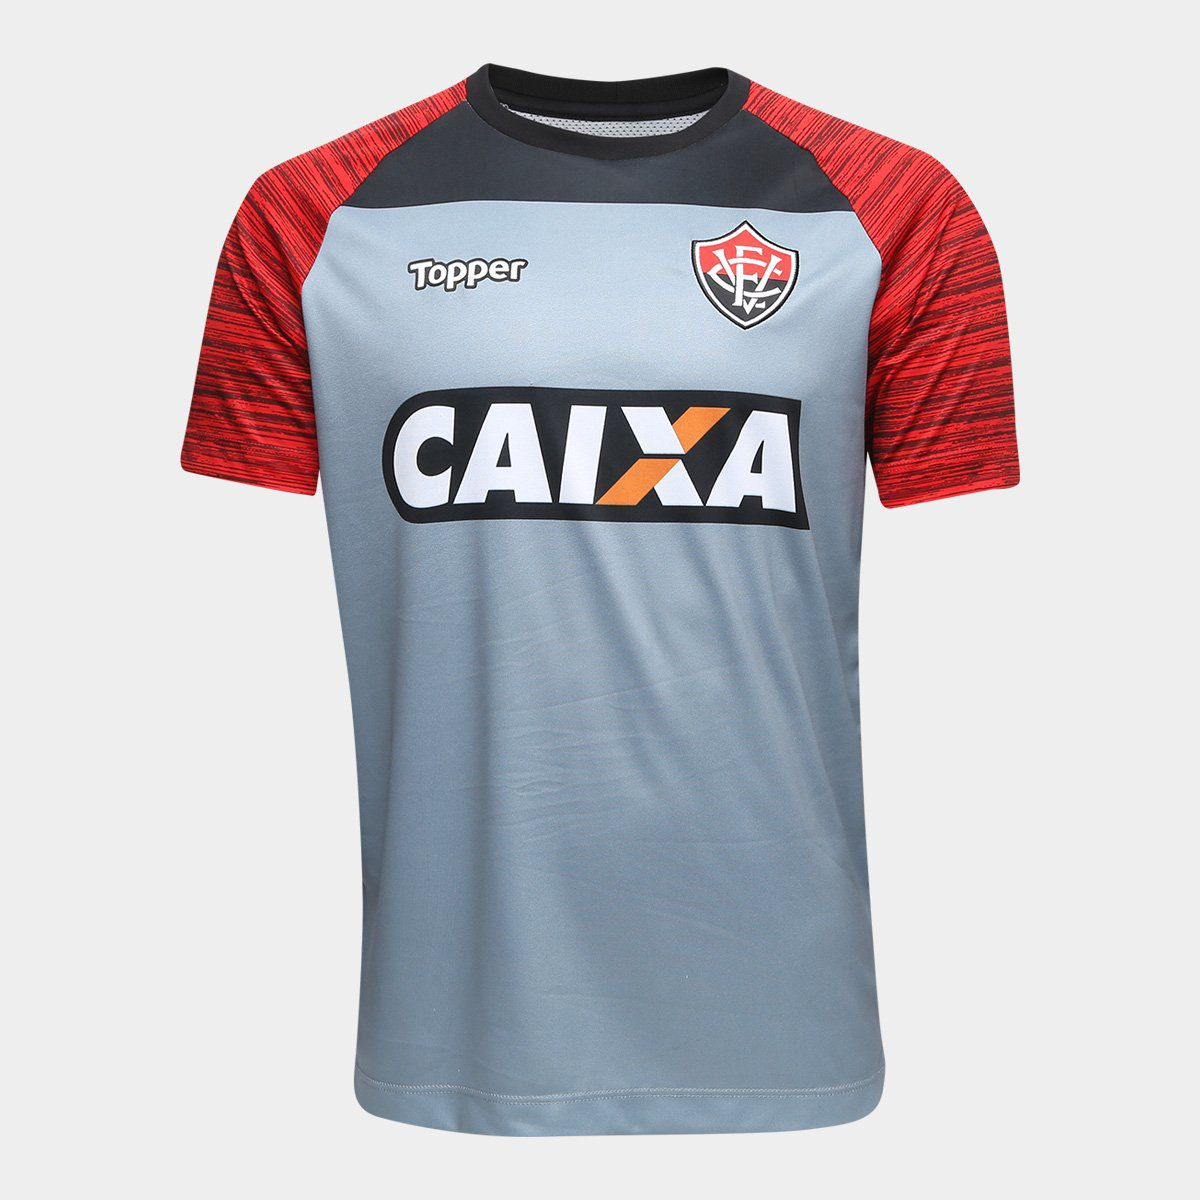 Camisa Treino Atleta Topper - 2018 - Masculina - Cinza